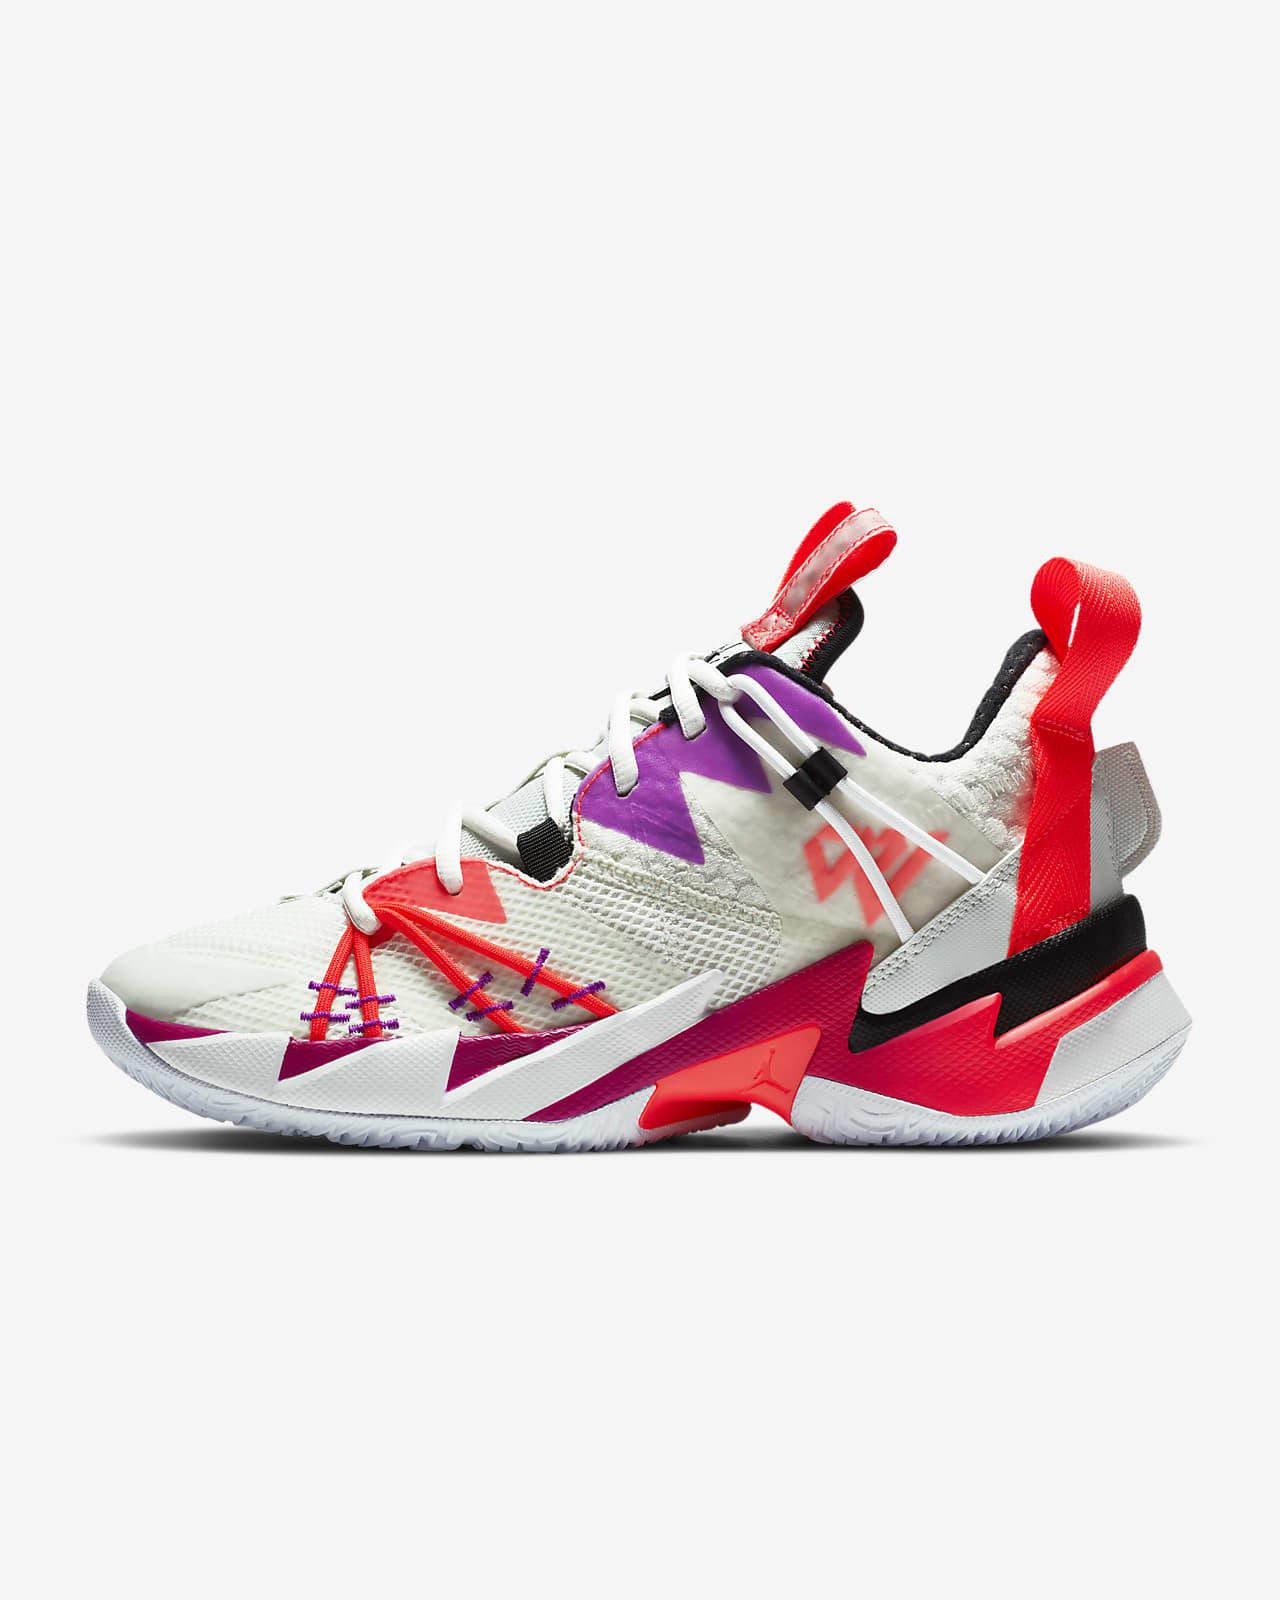 Jordan 'Why Not?' Zer0.3 SE PF Men's Basketball Shoe